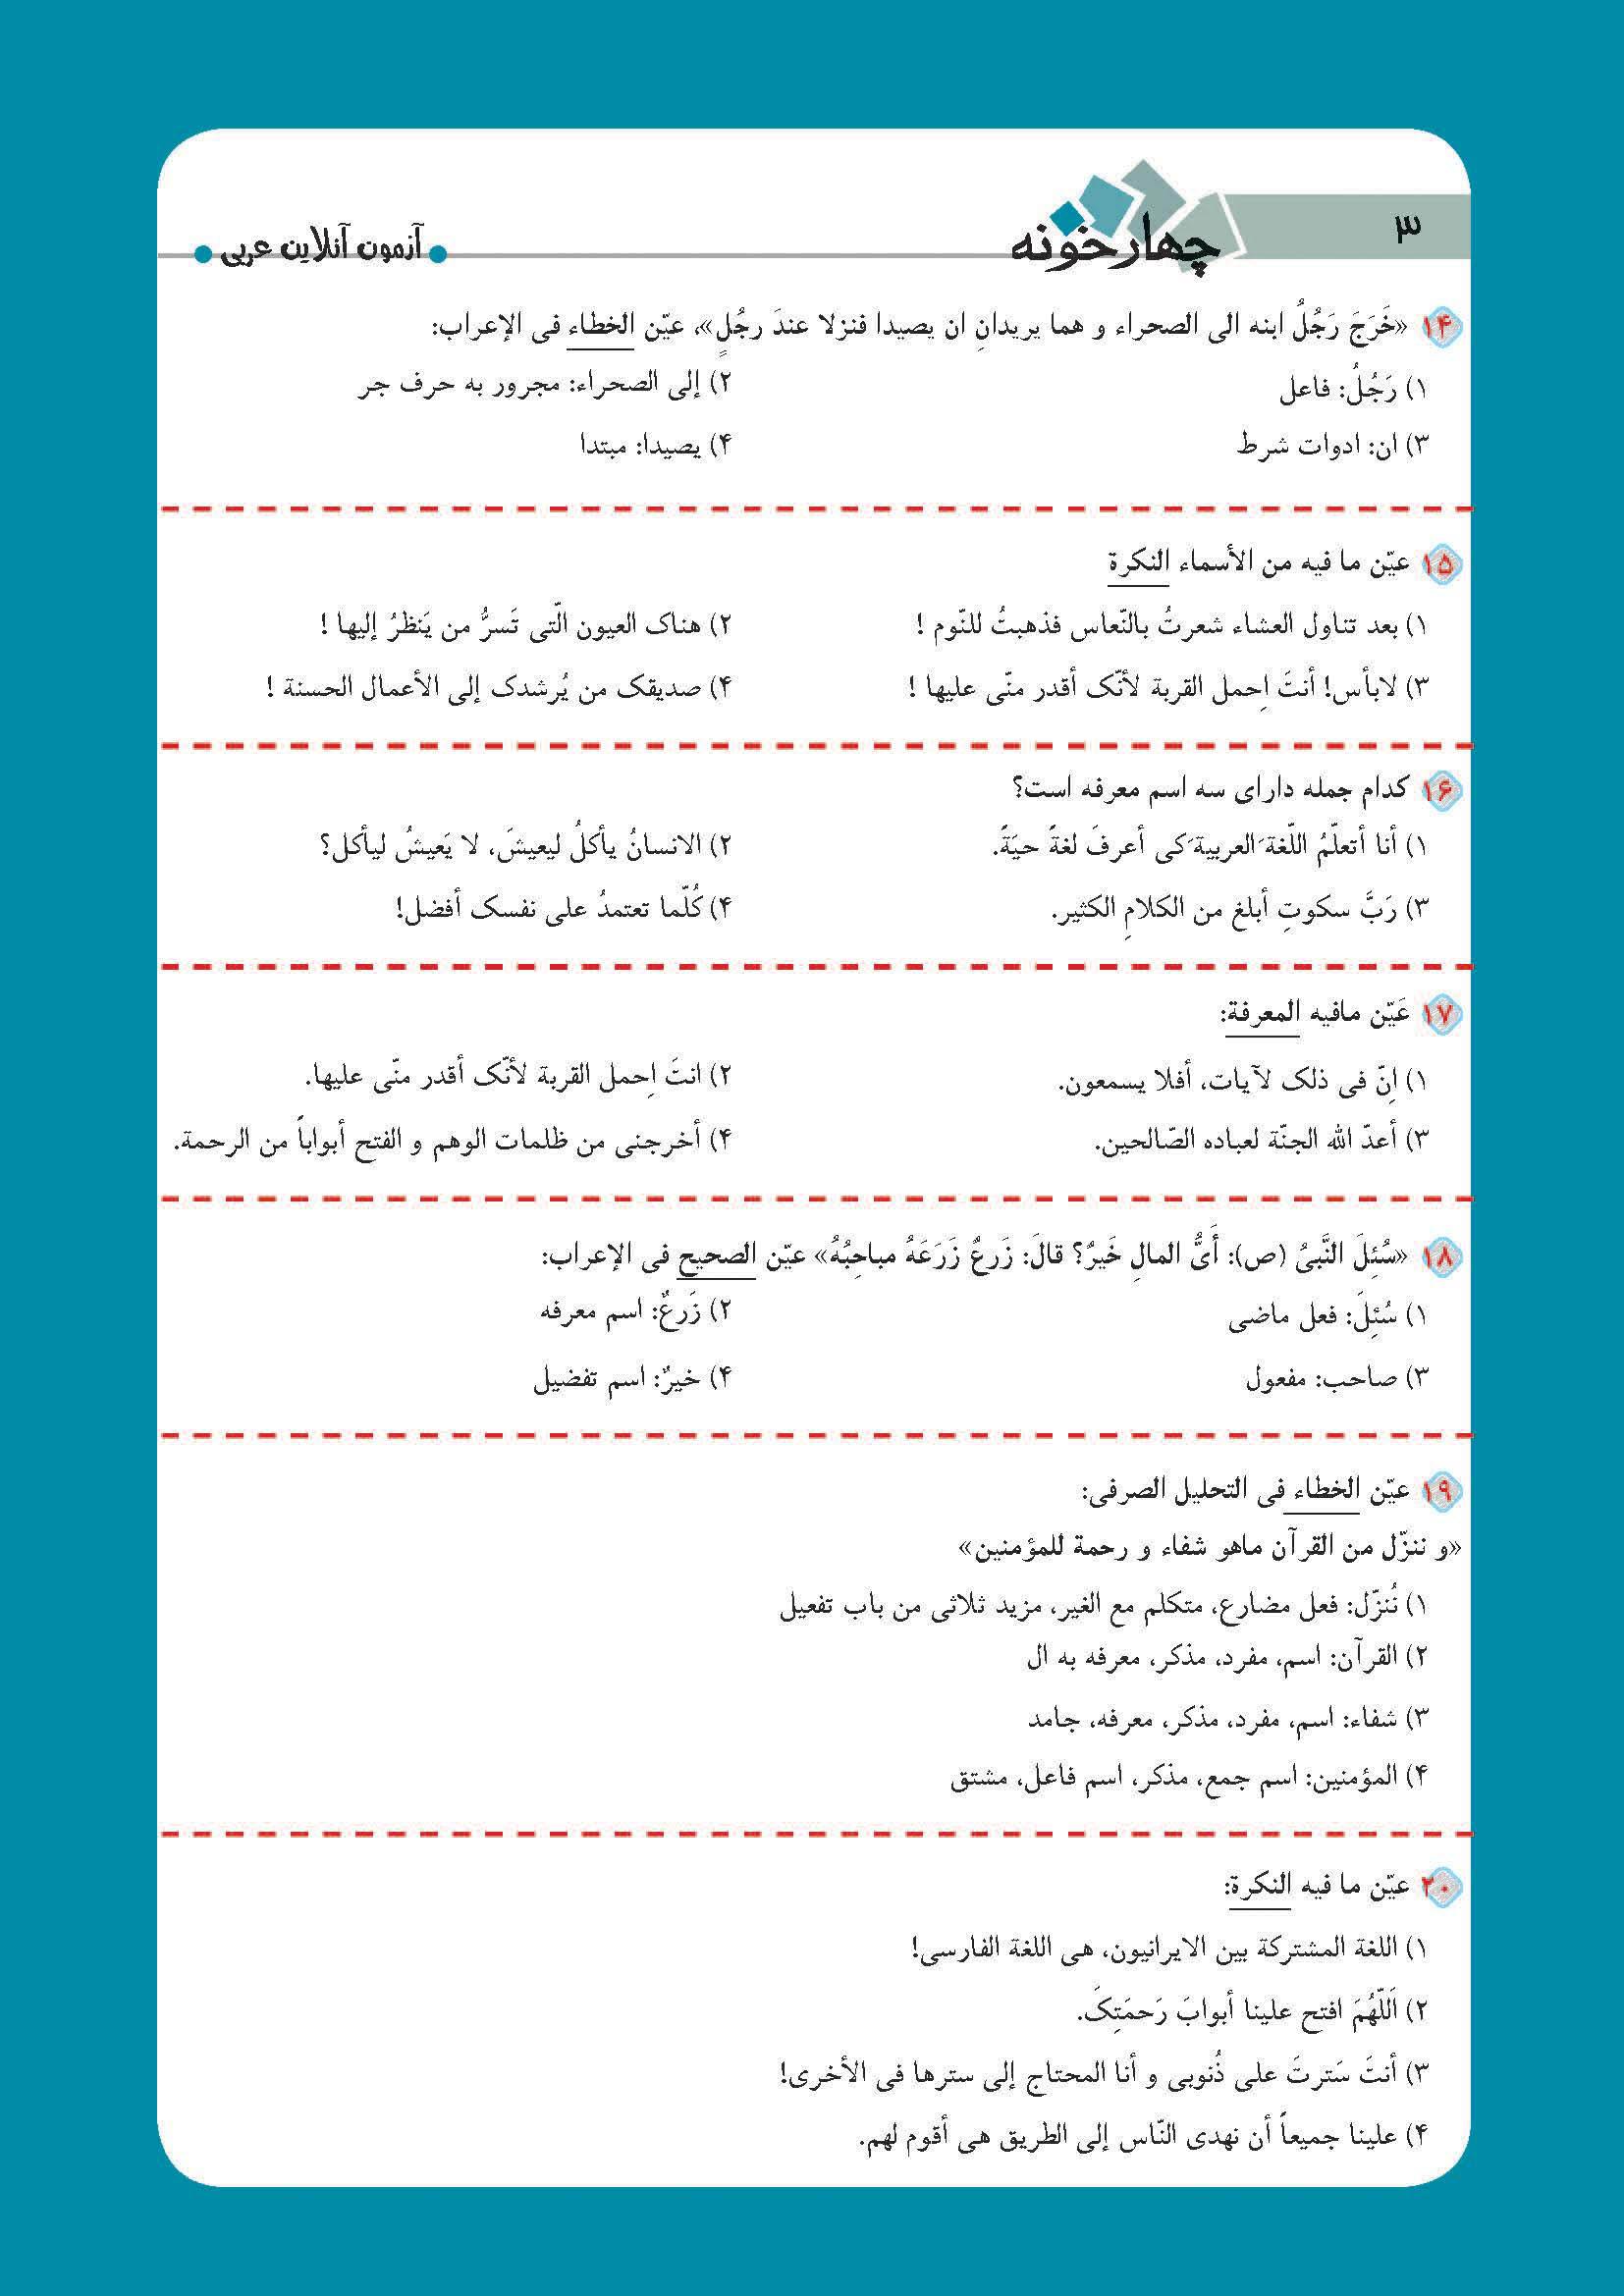 آزمون آنلاین عربی